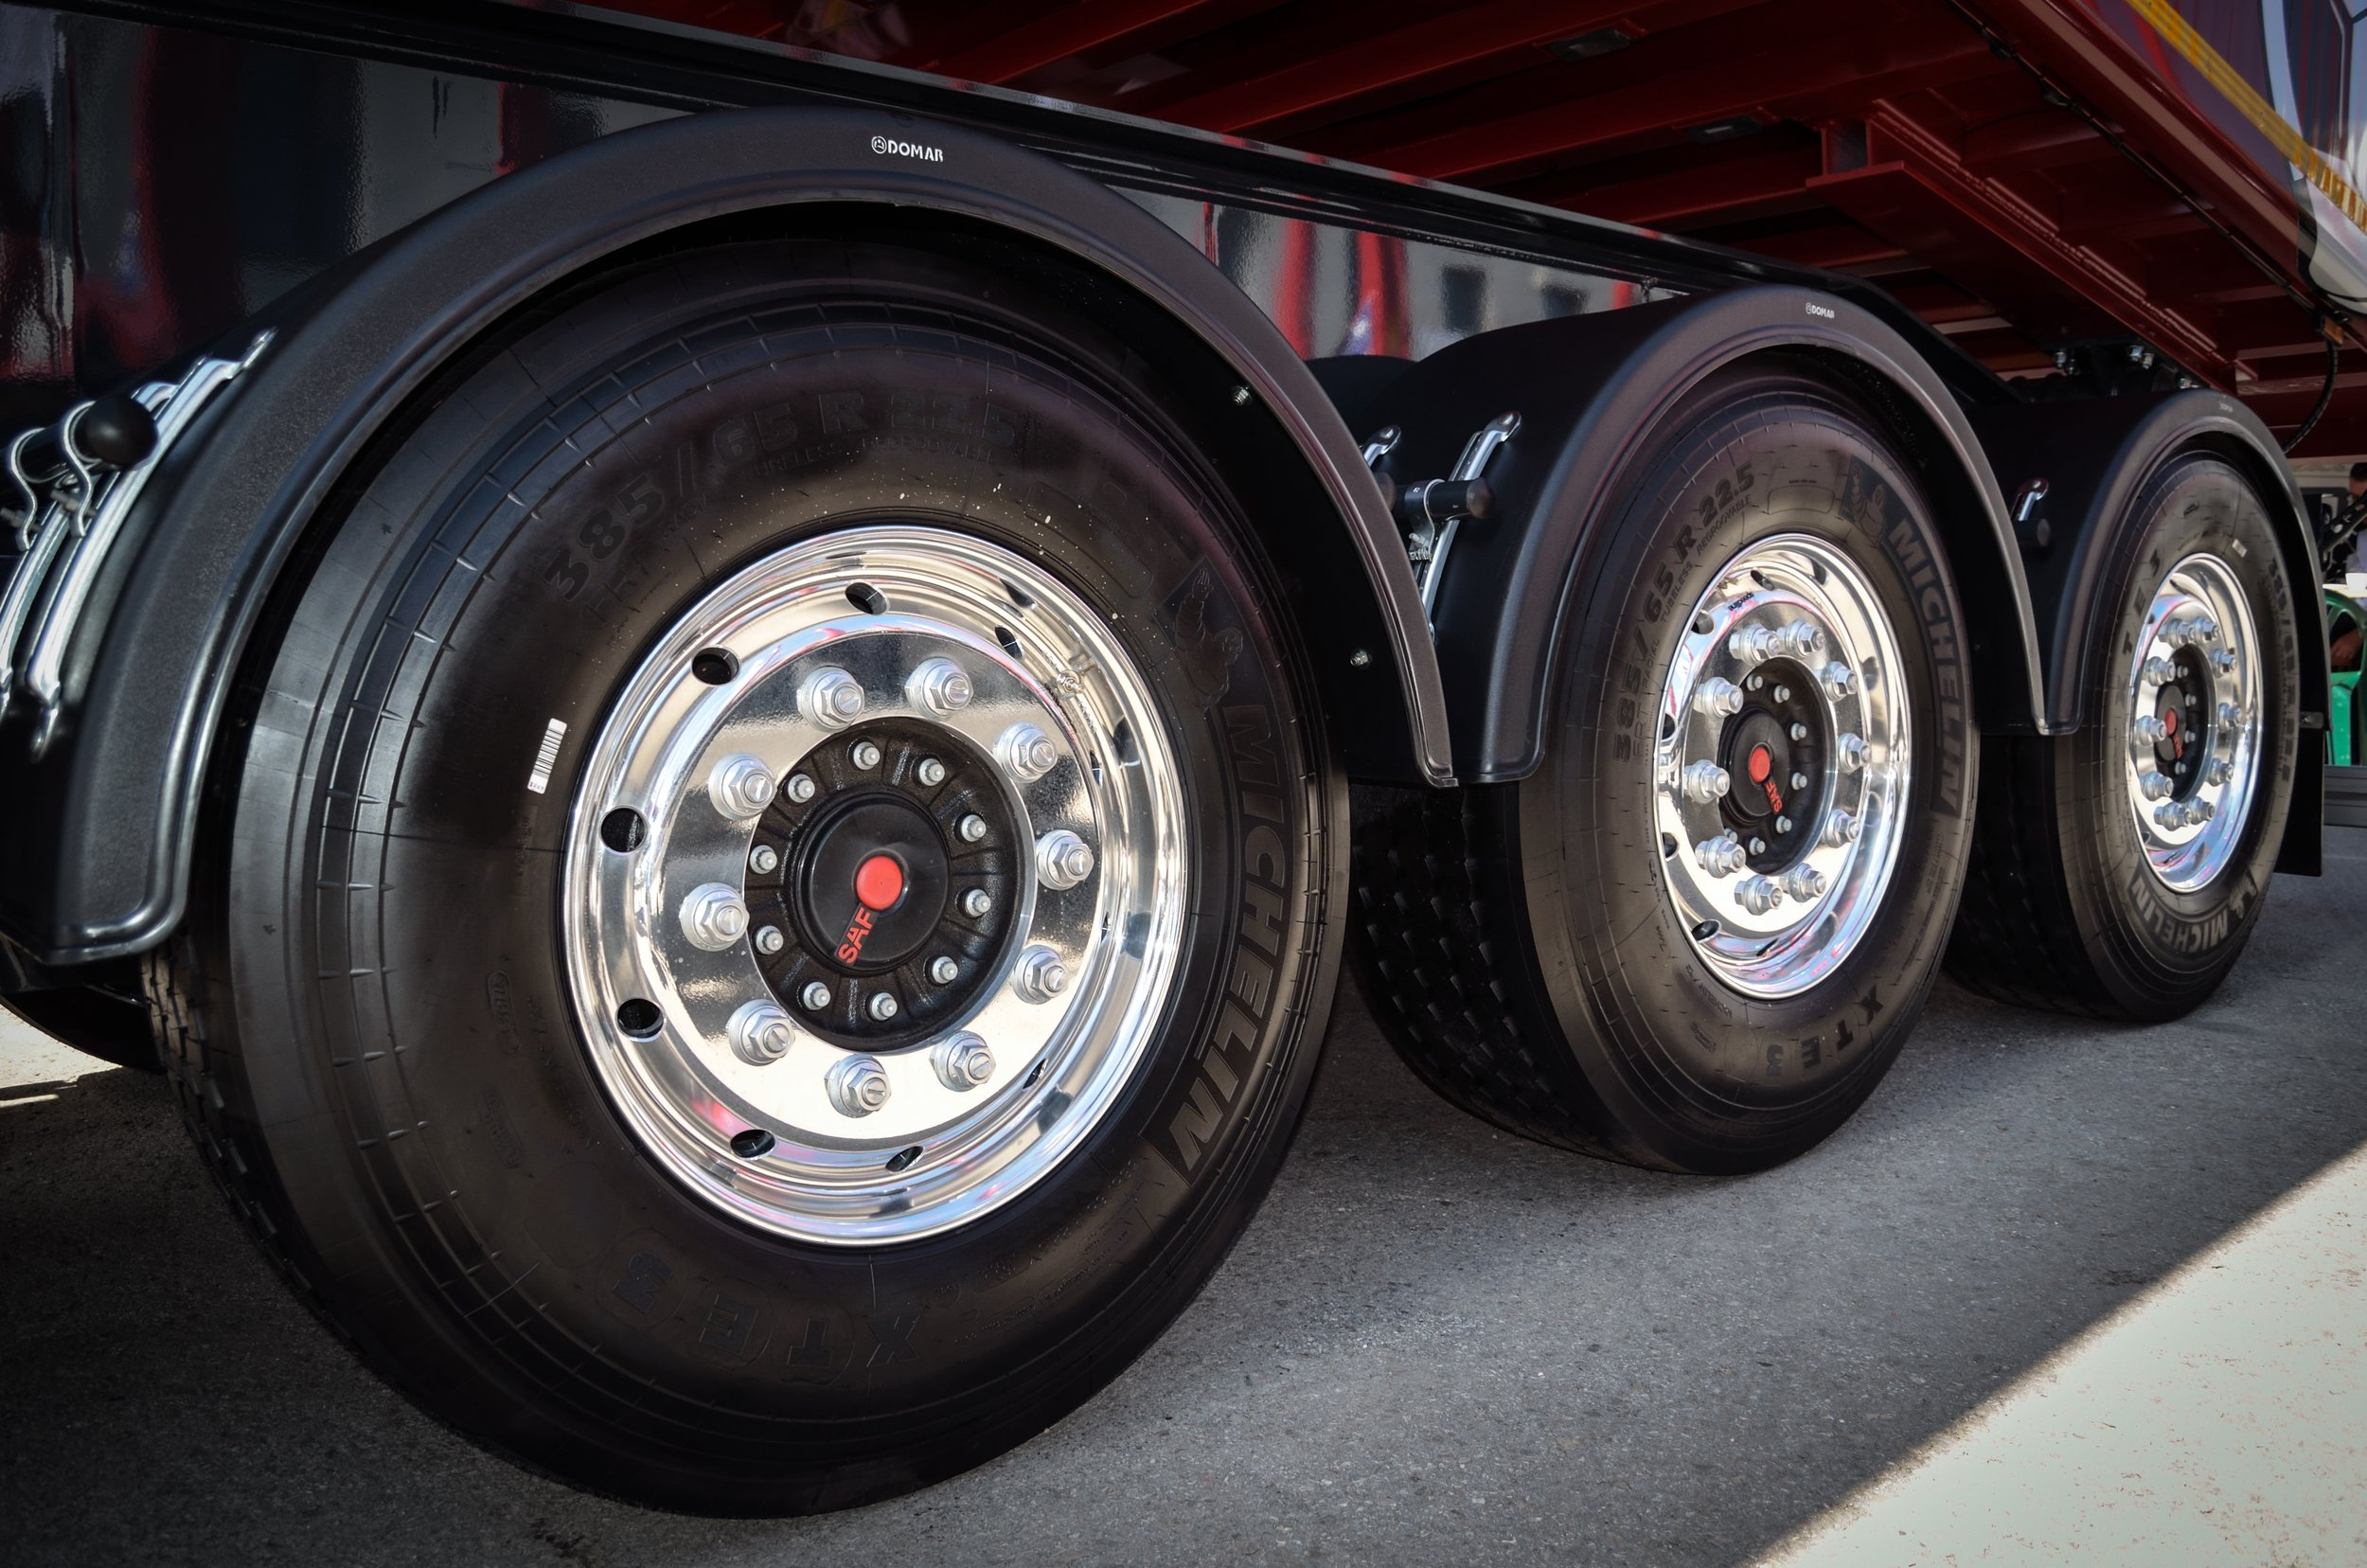 wheels_tire_wheel_car.jpg